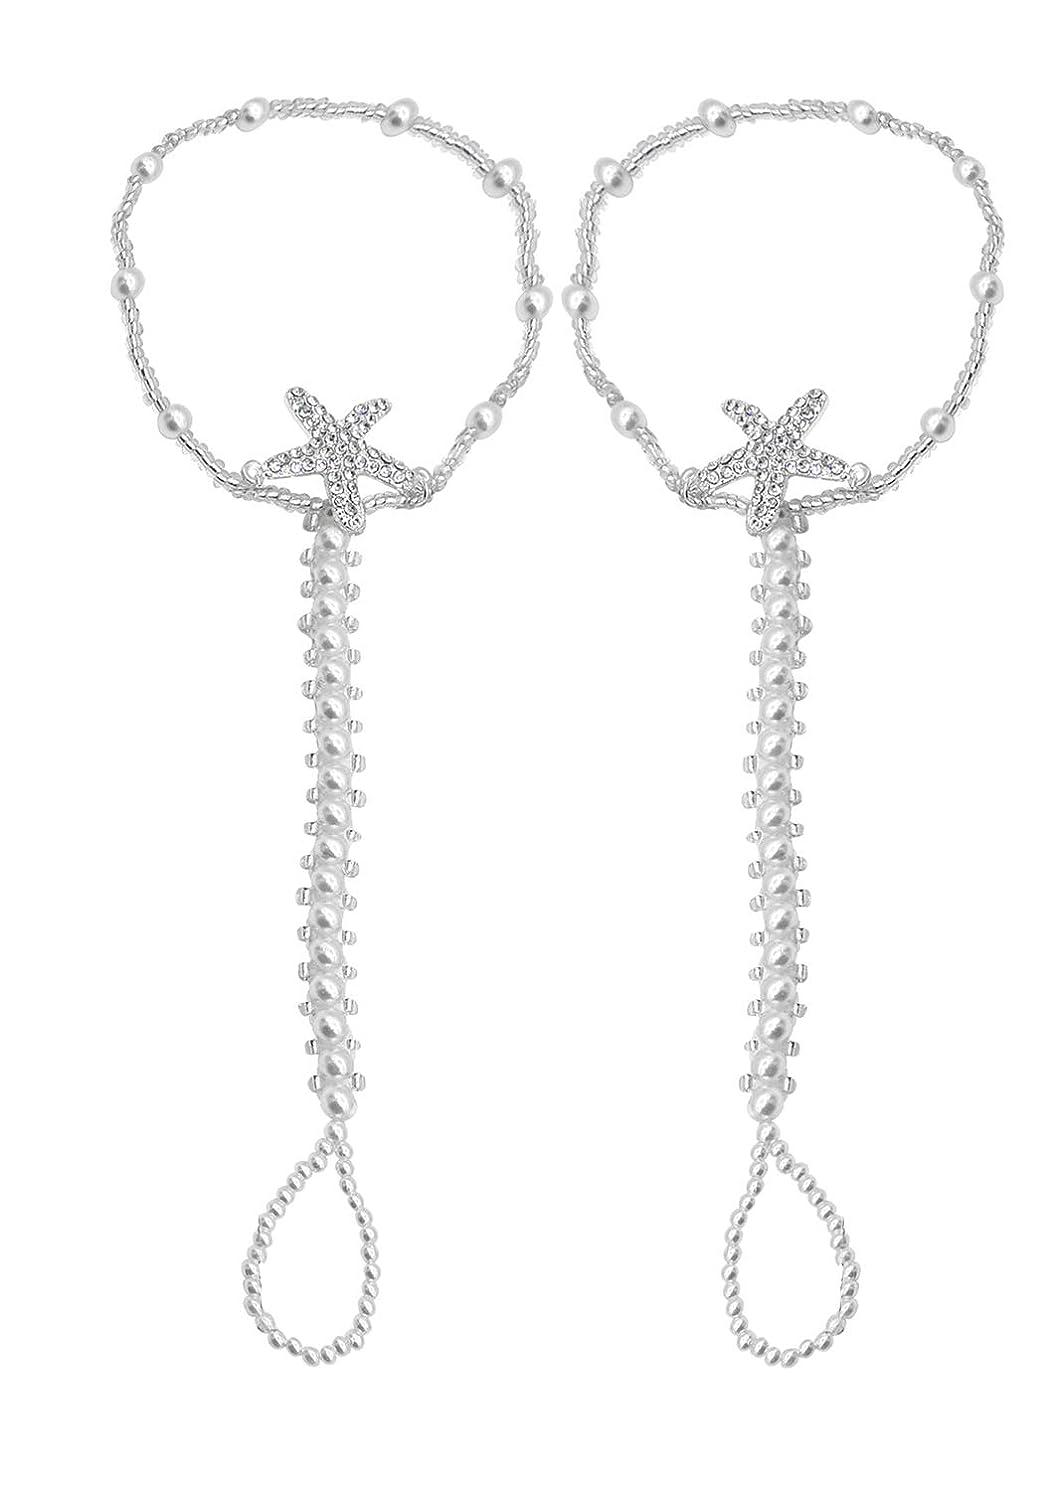 Bienvenu Bohemia Style Wedding Barefoot Sandals Beach Anklet Chain Foot Jewelry